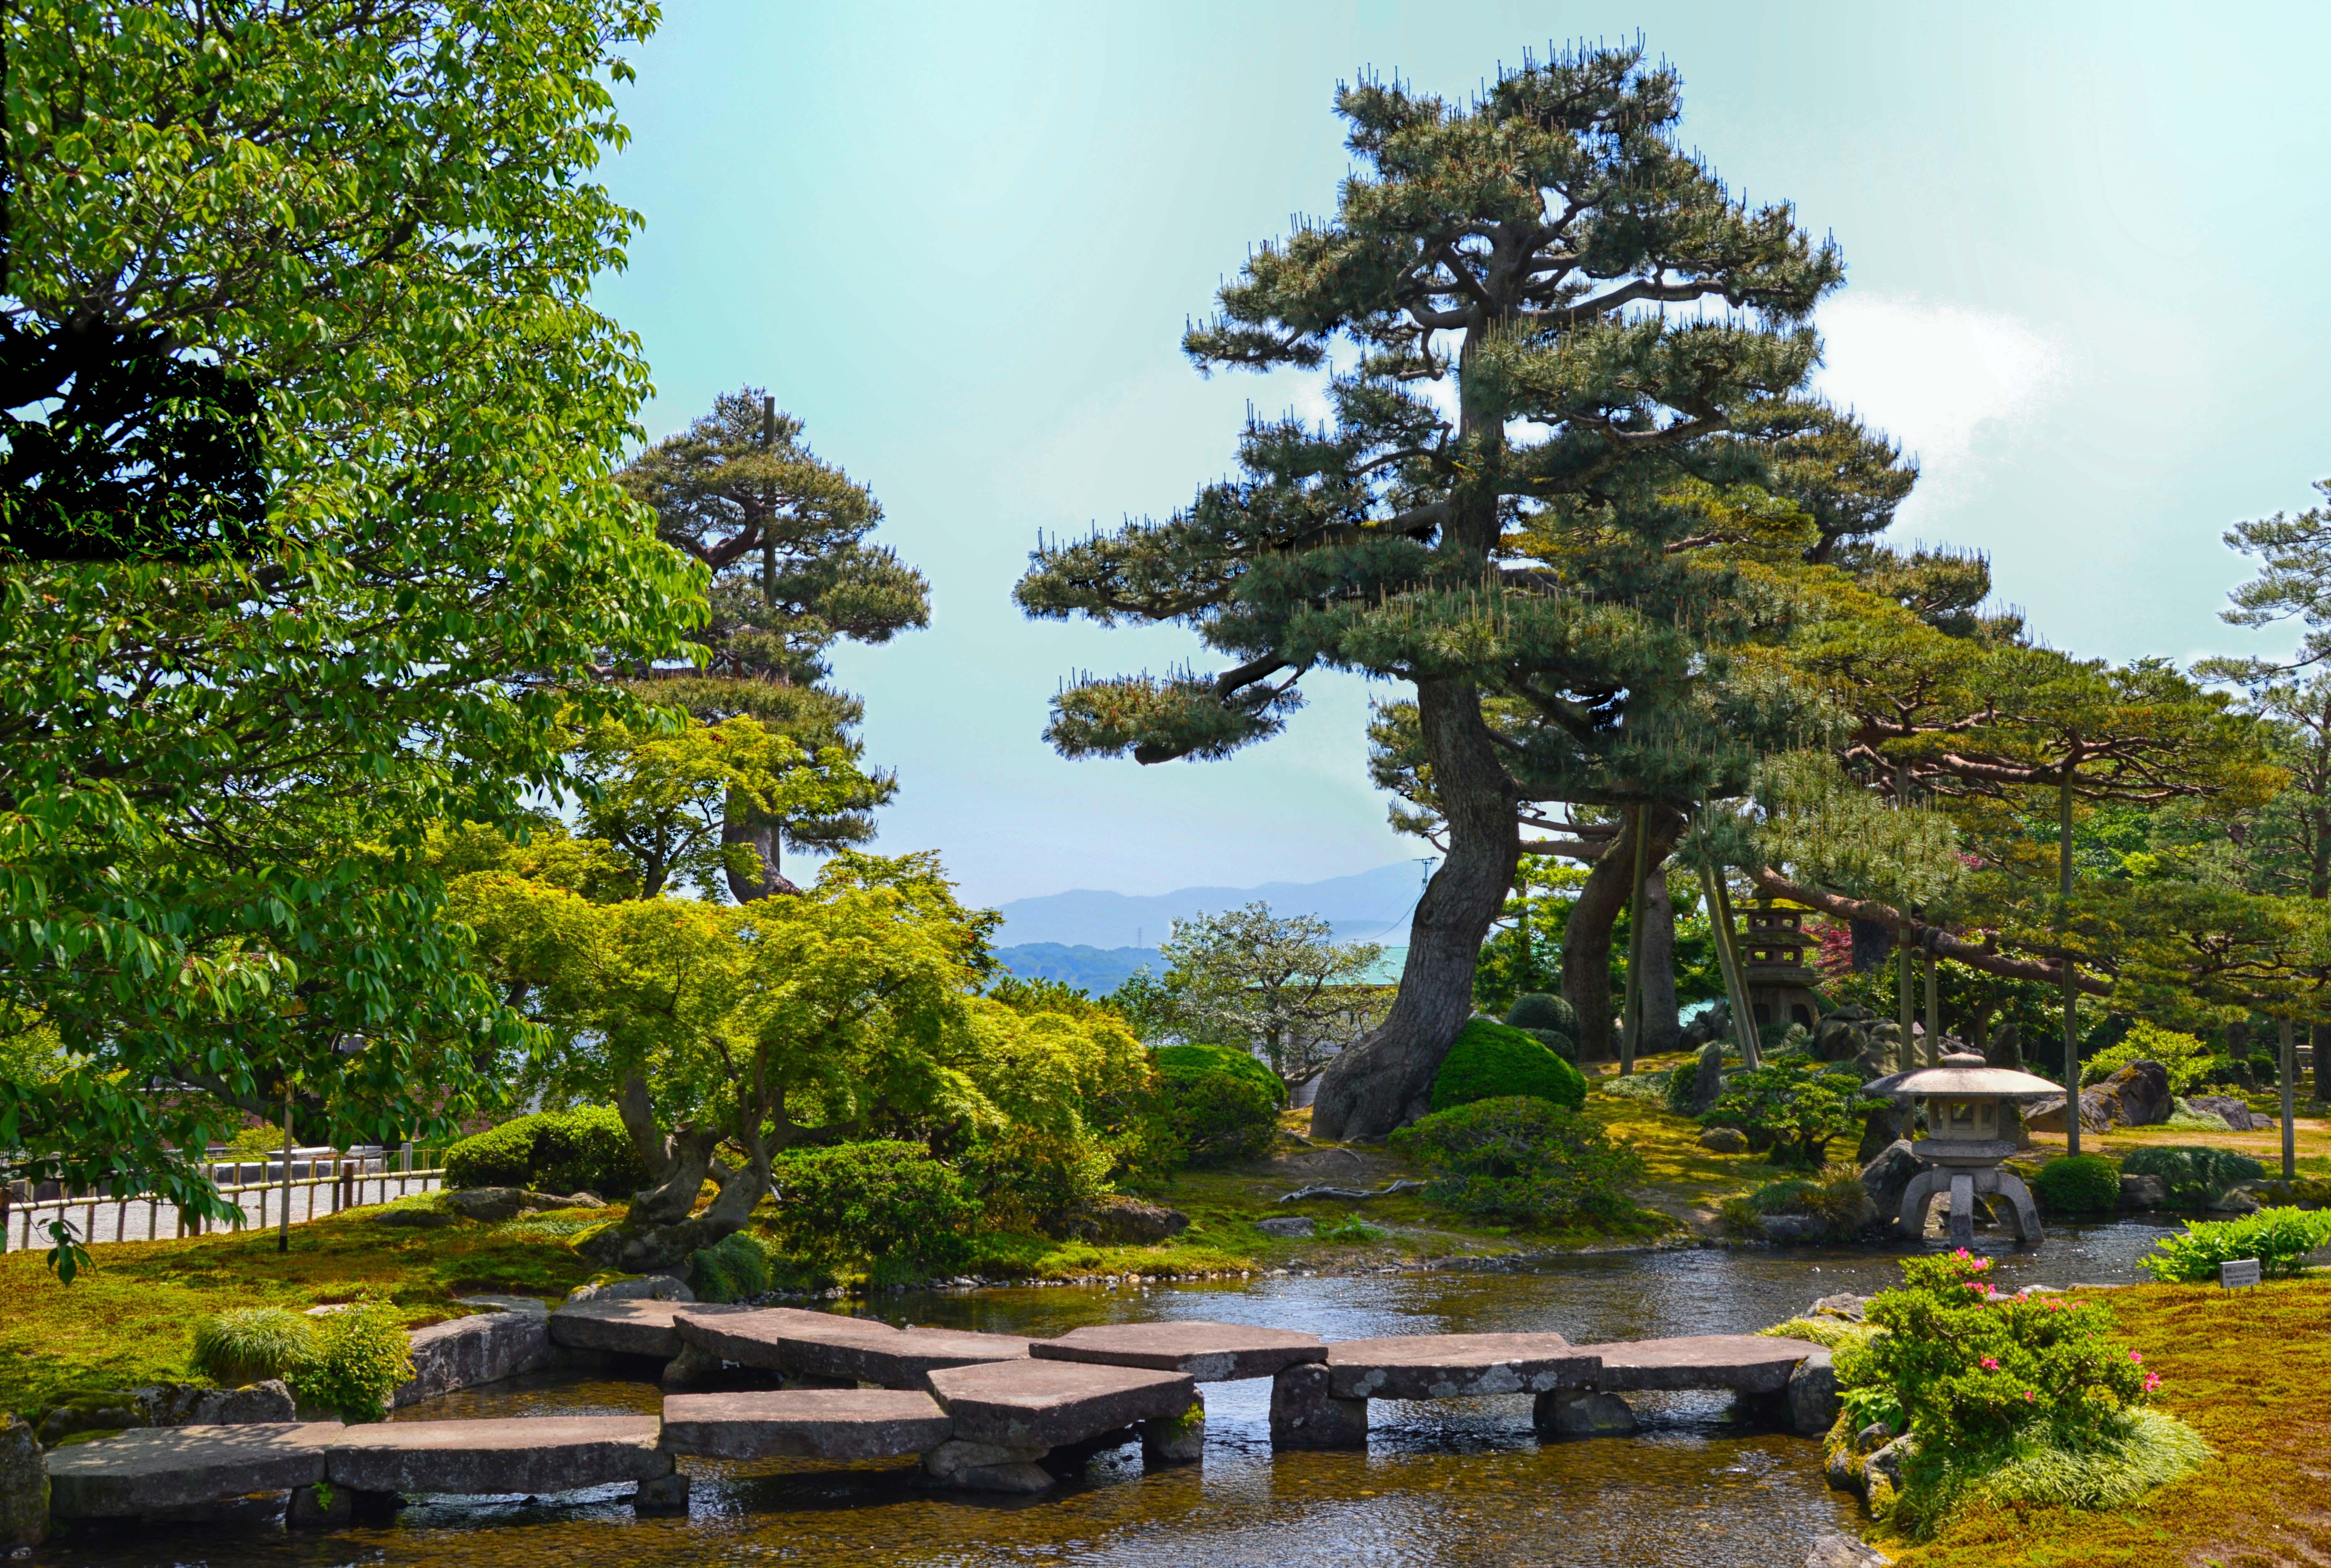 Japan garden_3a